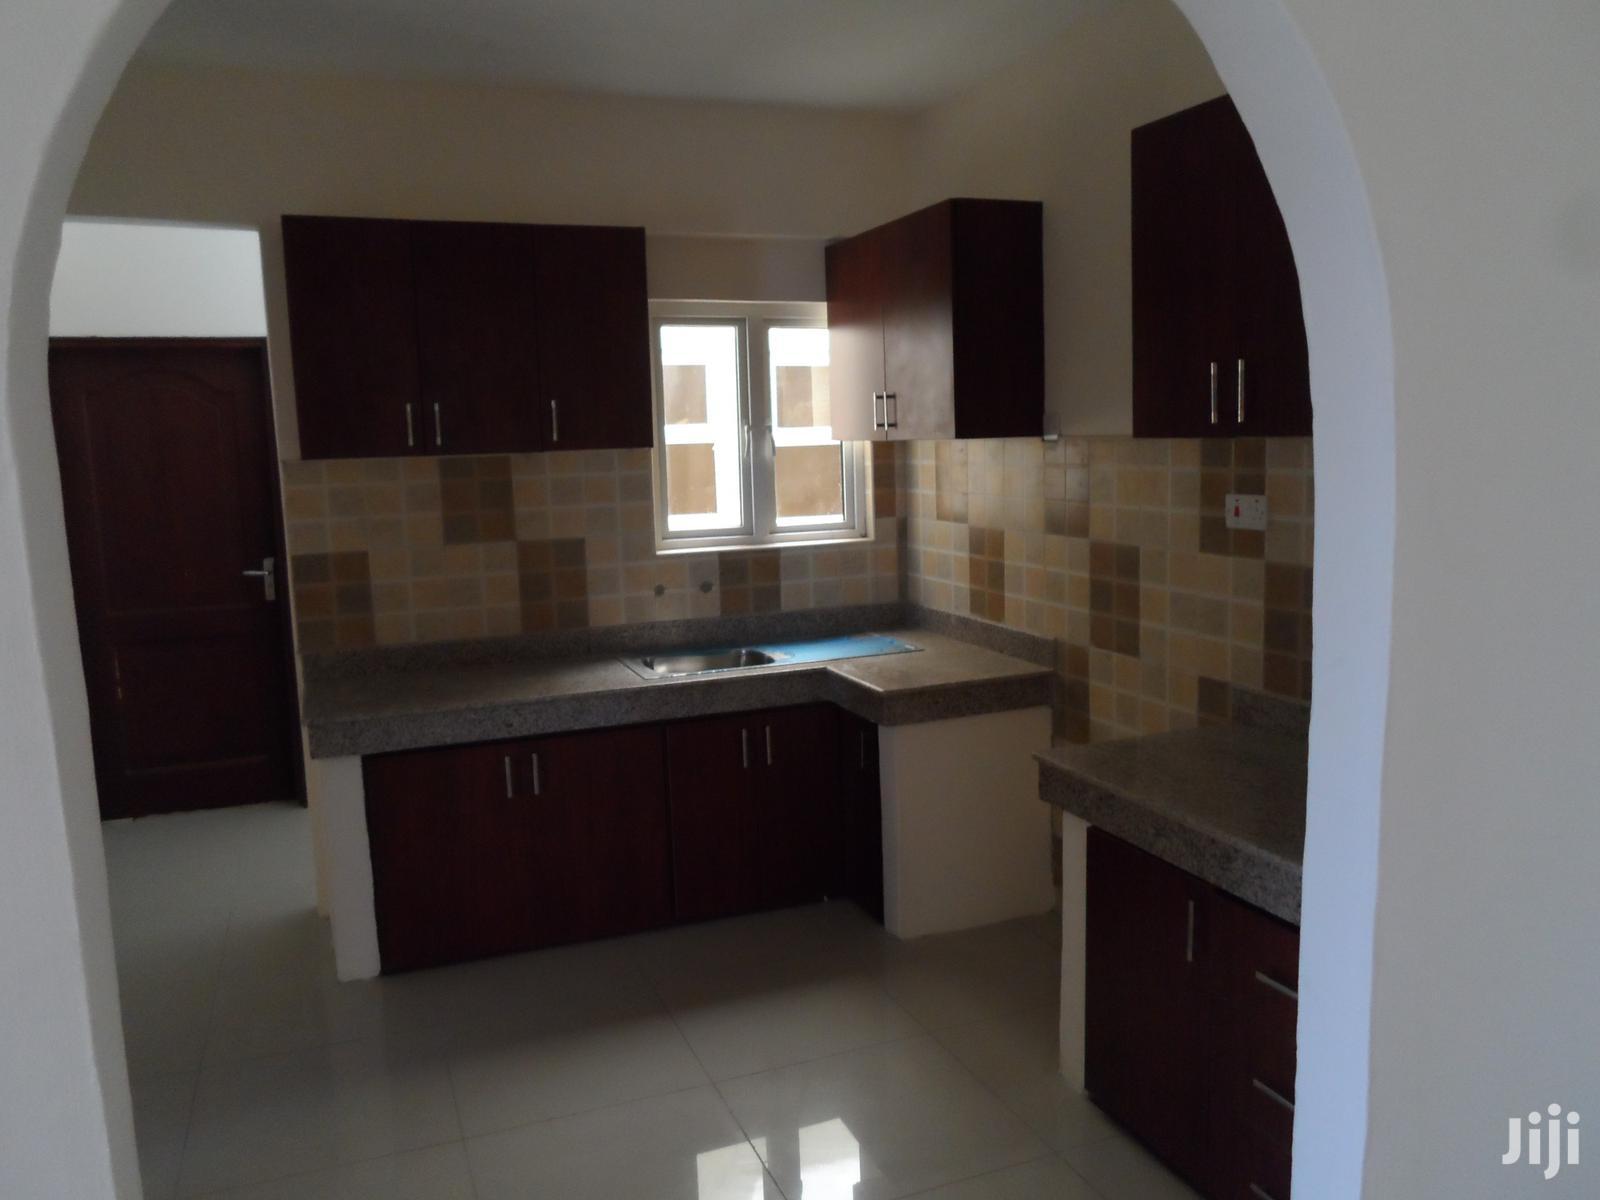 3br Medium Sea View Apartment Nyali/Benford Homes | Houses & Apartments For Rent for sale in Nyali, Mombasa, Kenya